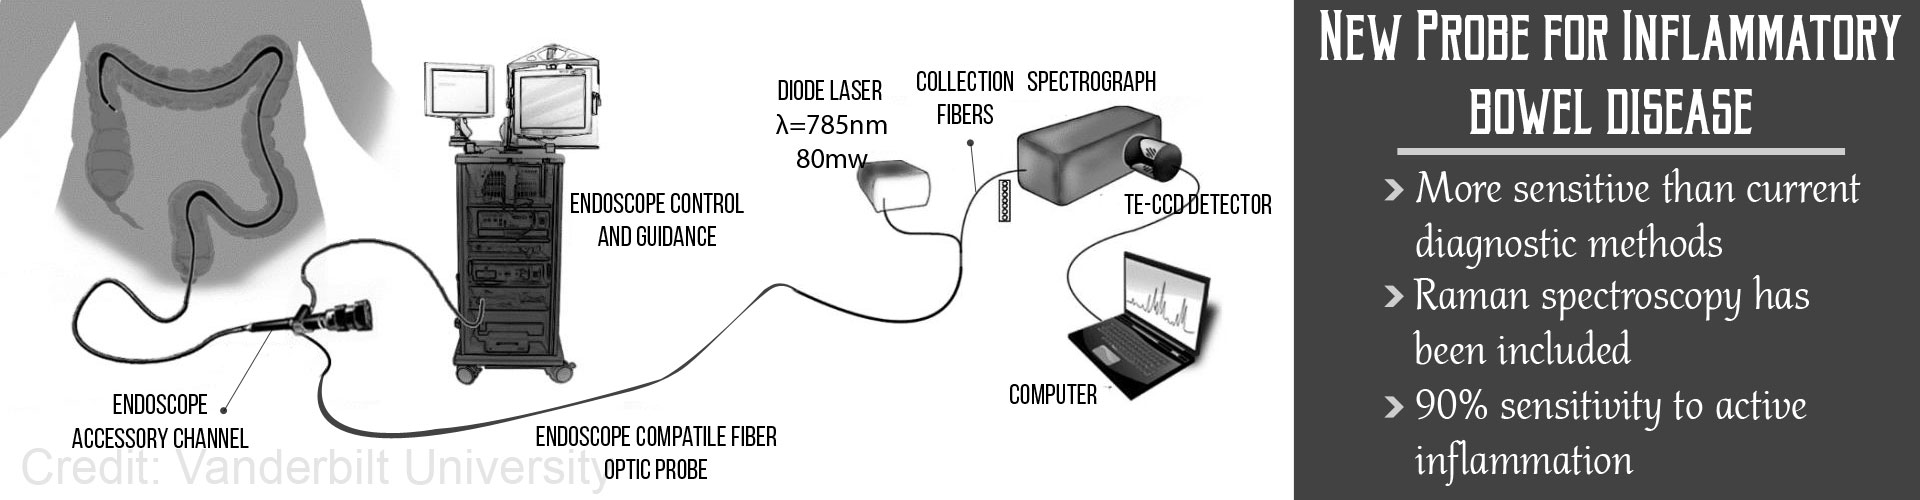 New Probe To Detect Inflammatory Bowel Disease During Routine Fiber Optic Diagram A Colonoscopy